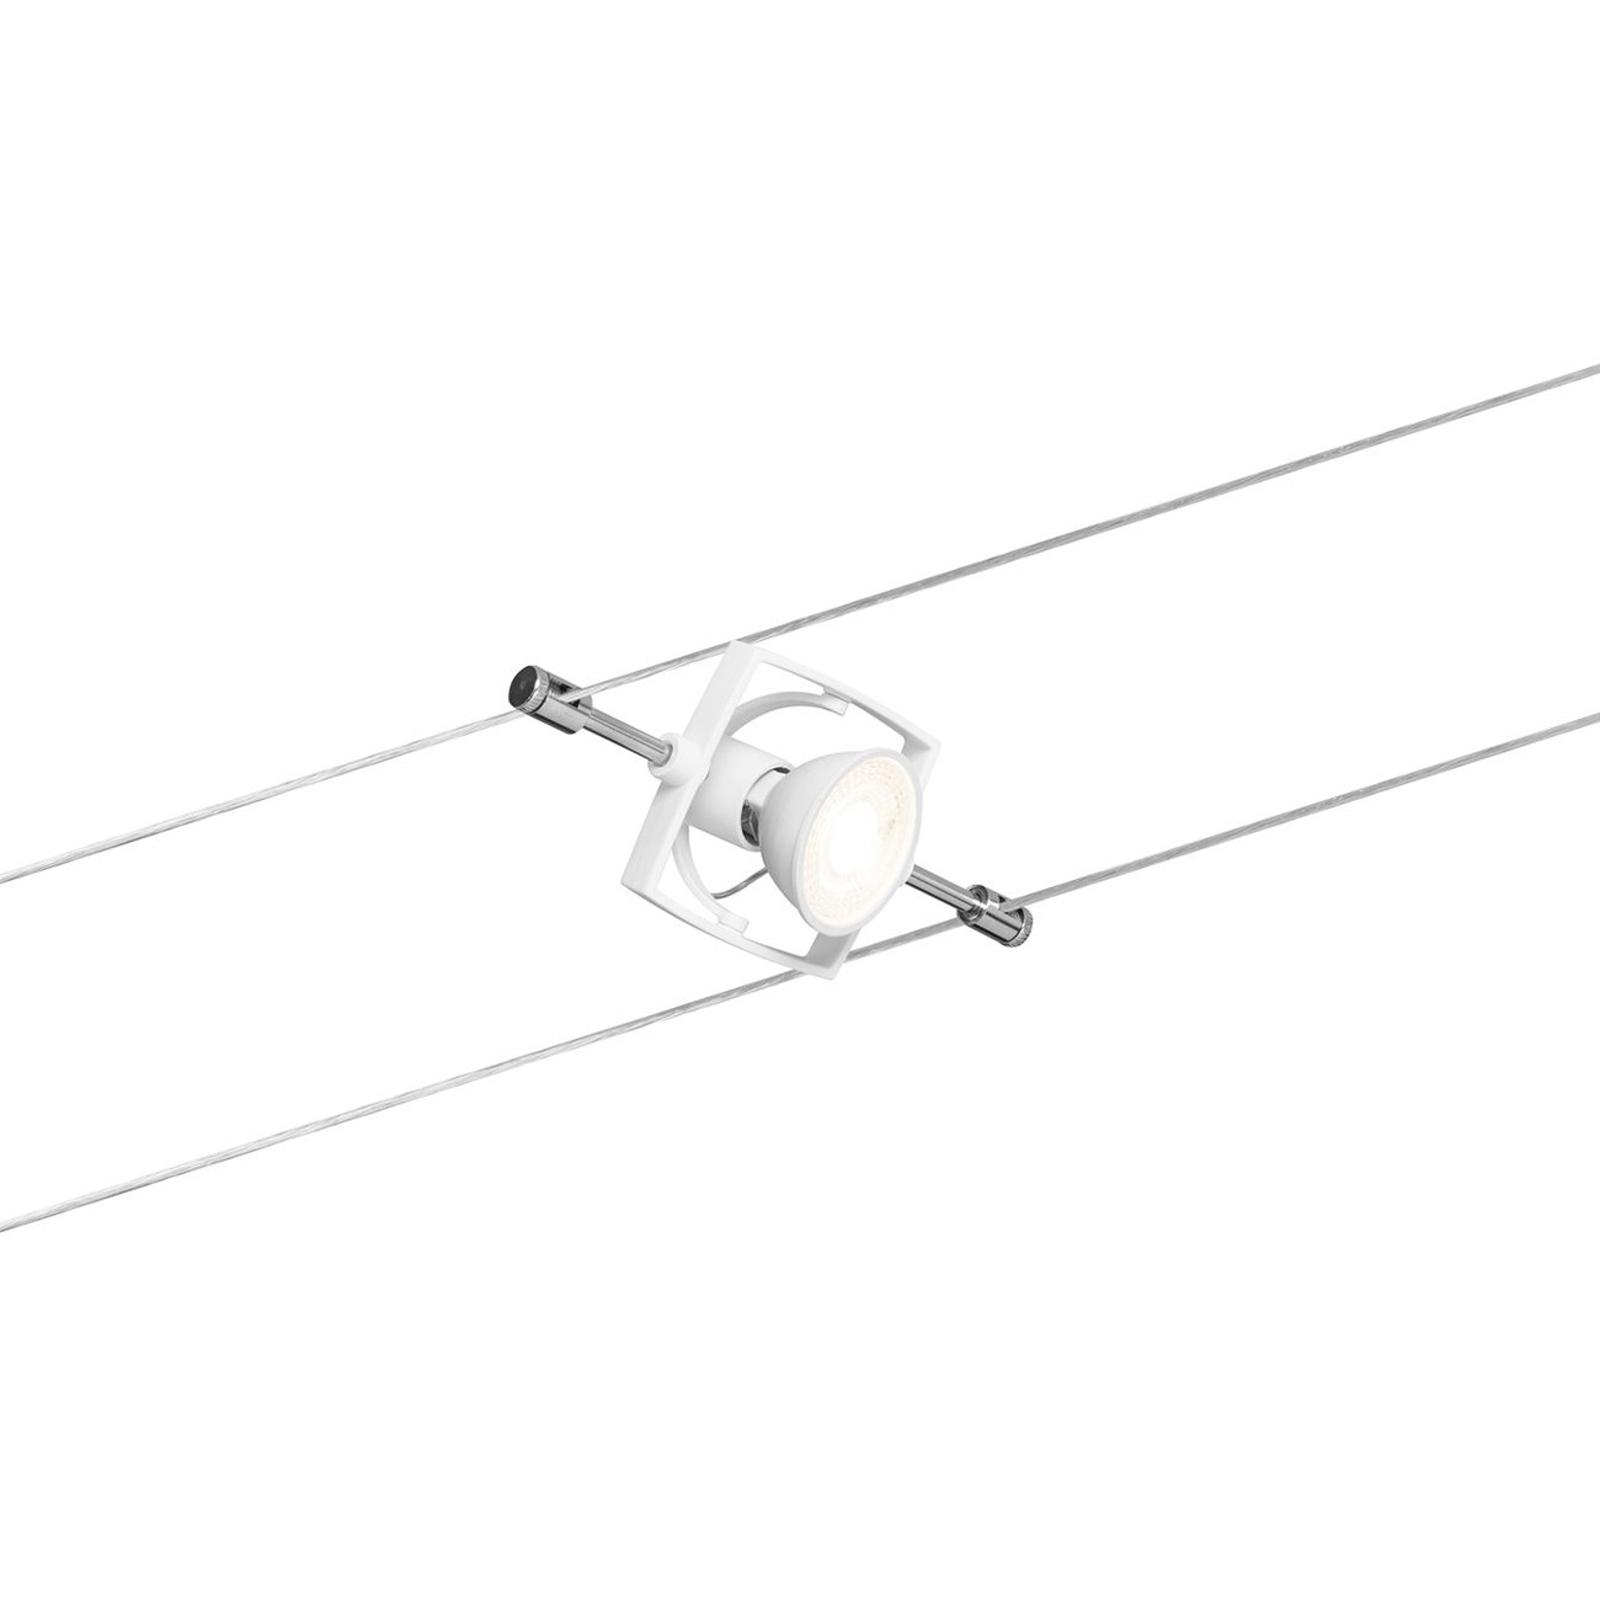 Paulmann Mac II Seilsystem, fünfflammig, weiß